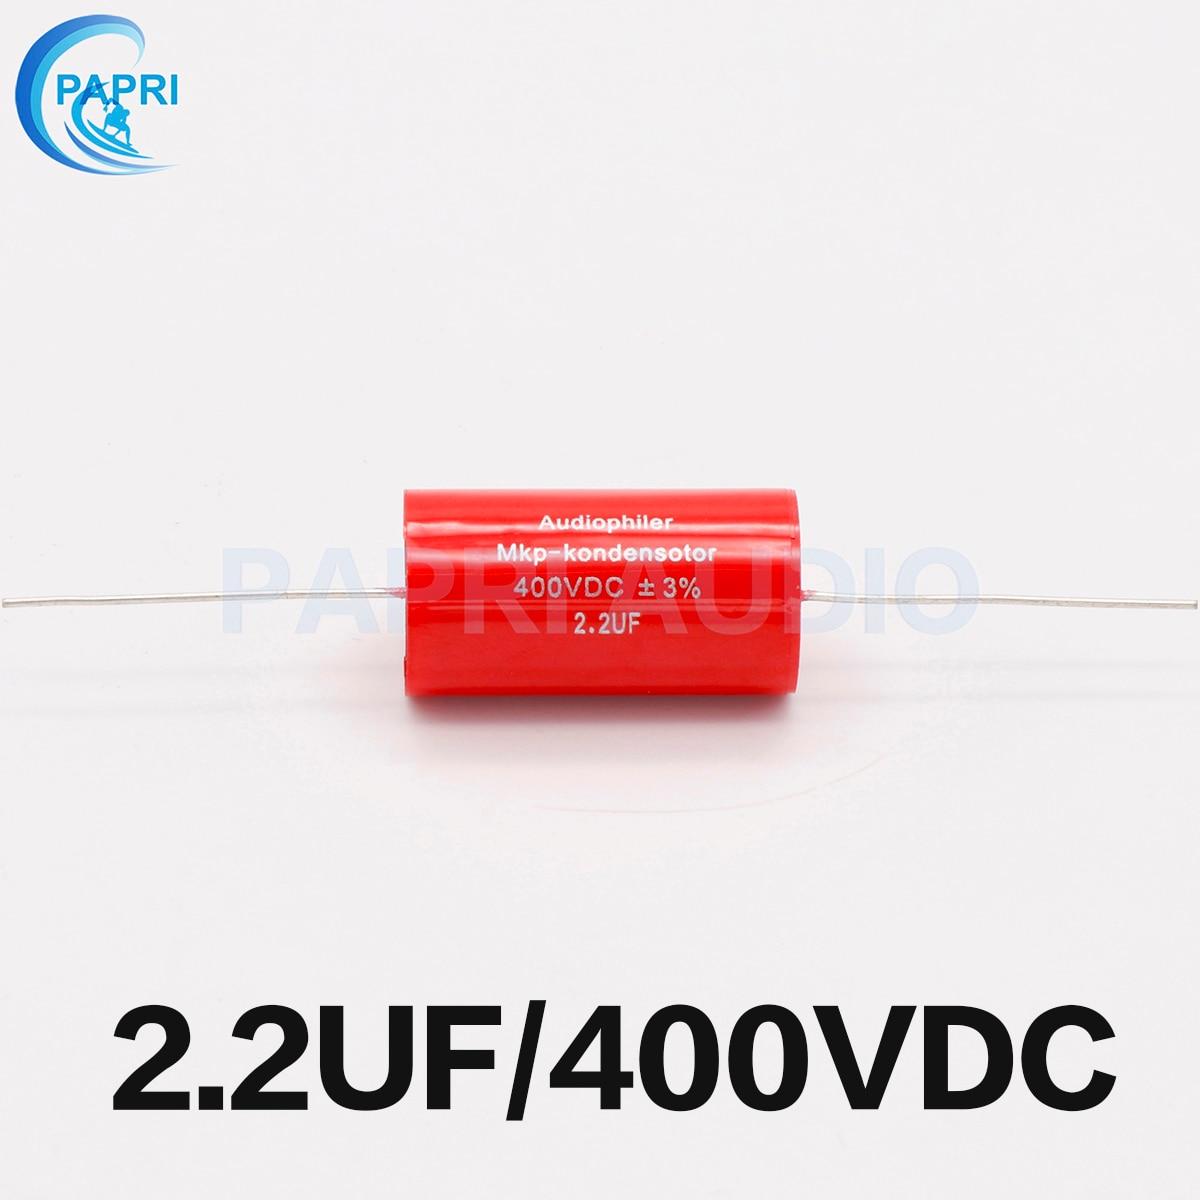 5pcs MKP 1uF 400V DC Audiophiler Audio Grade Capacitor for Guitar Parts Amp